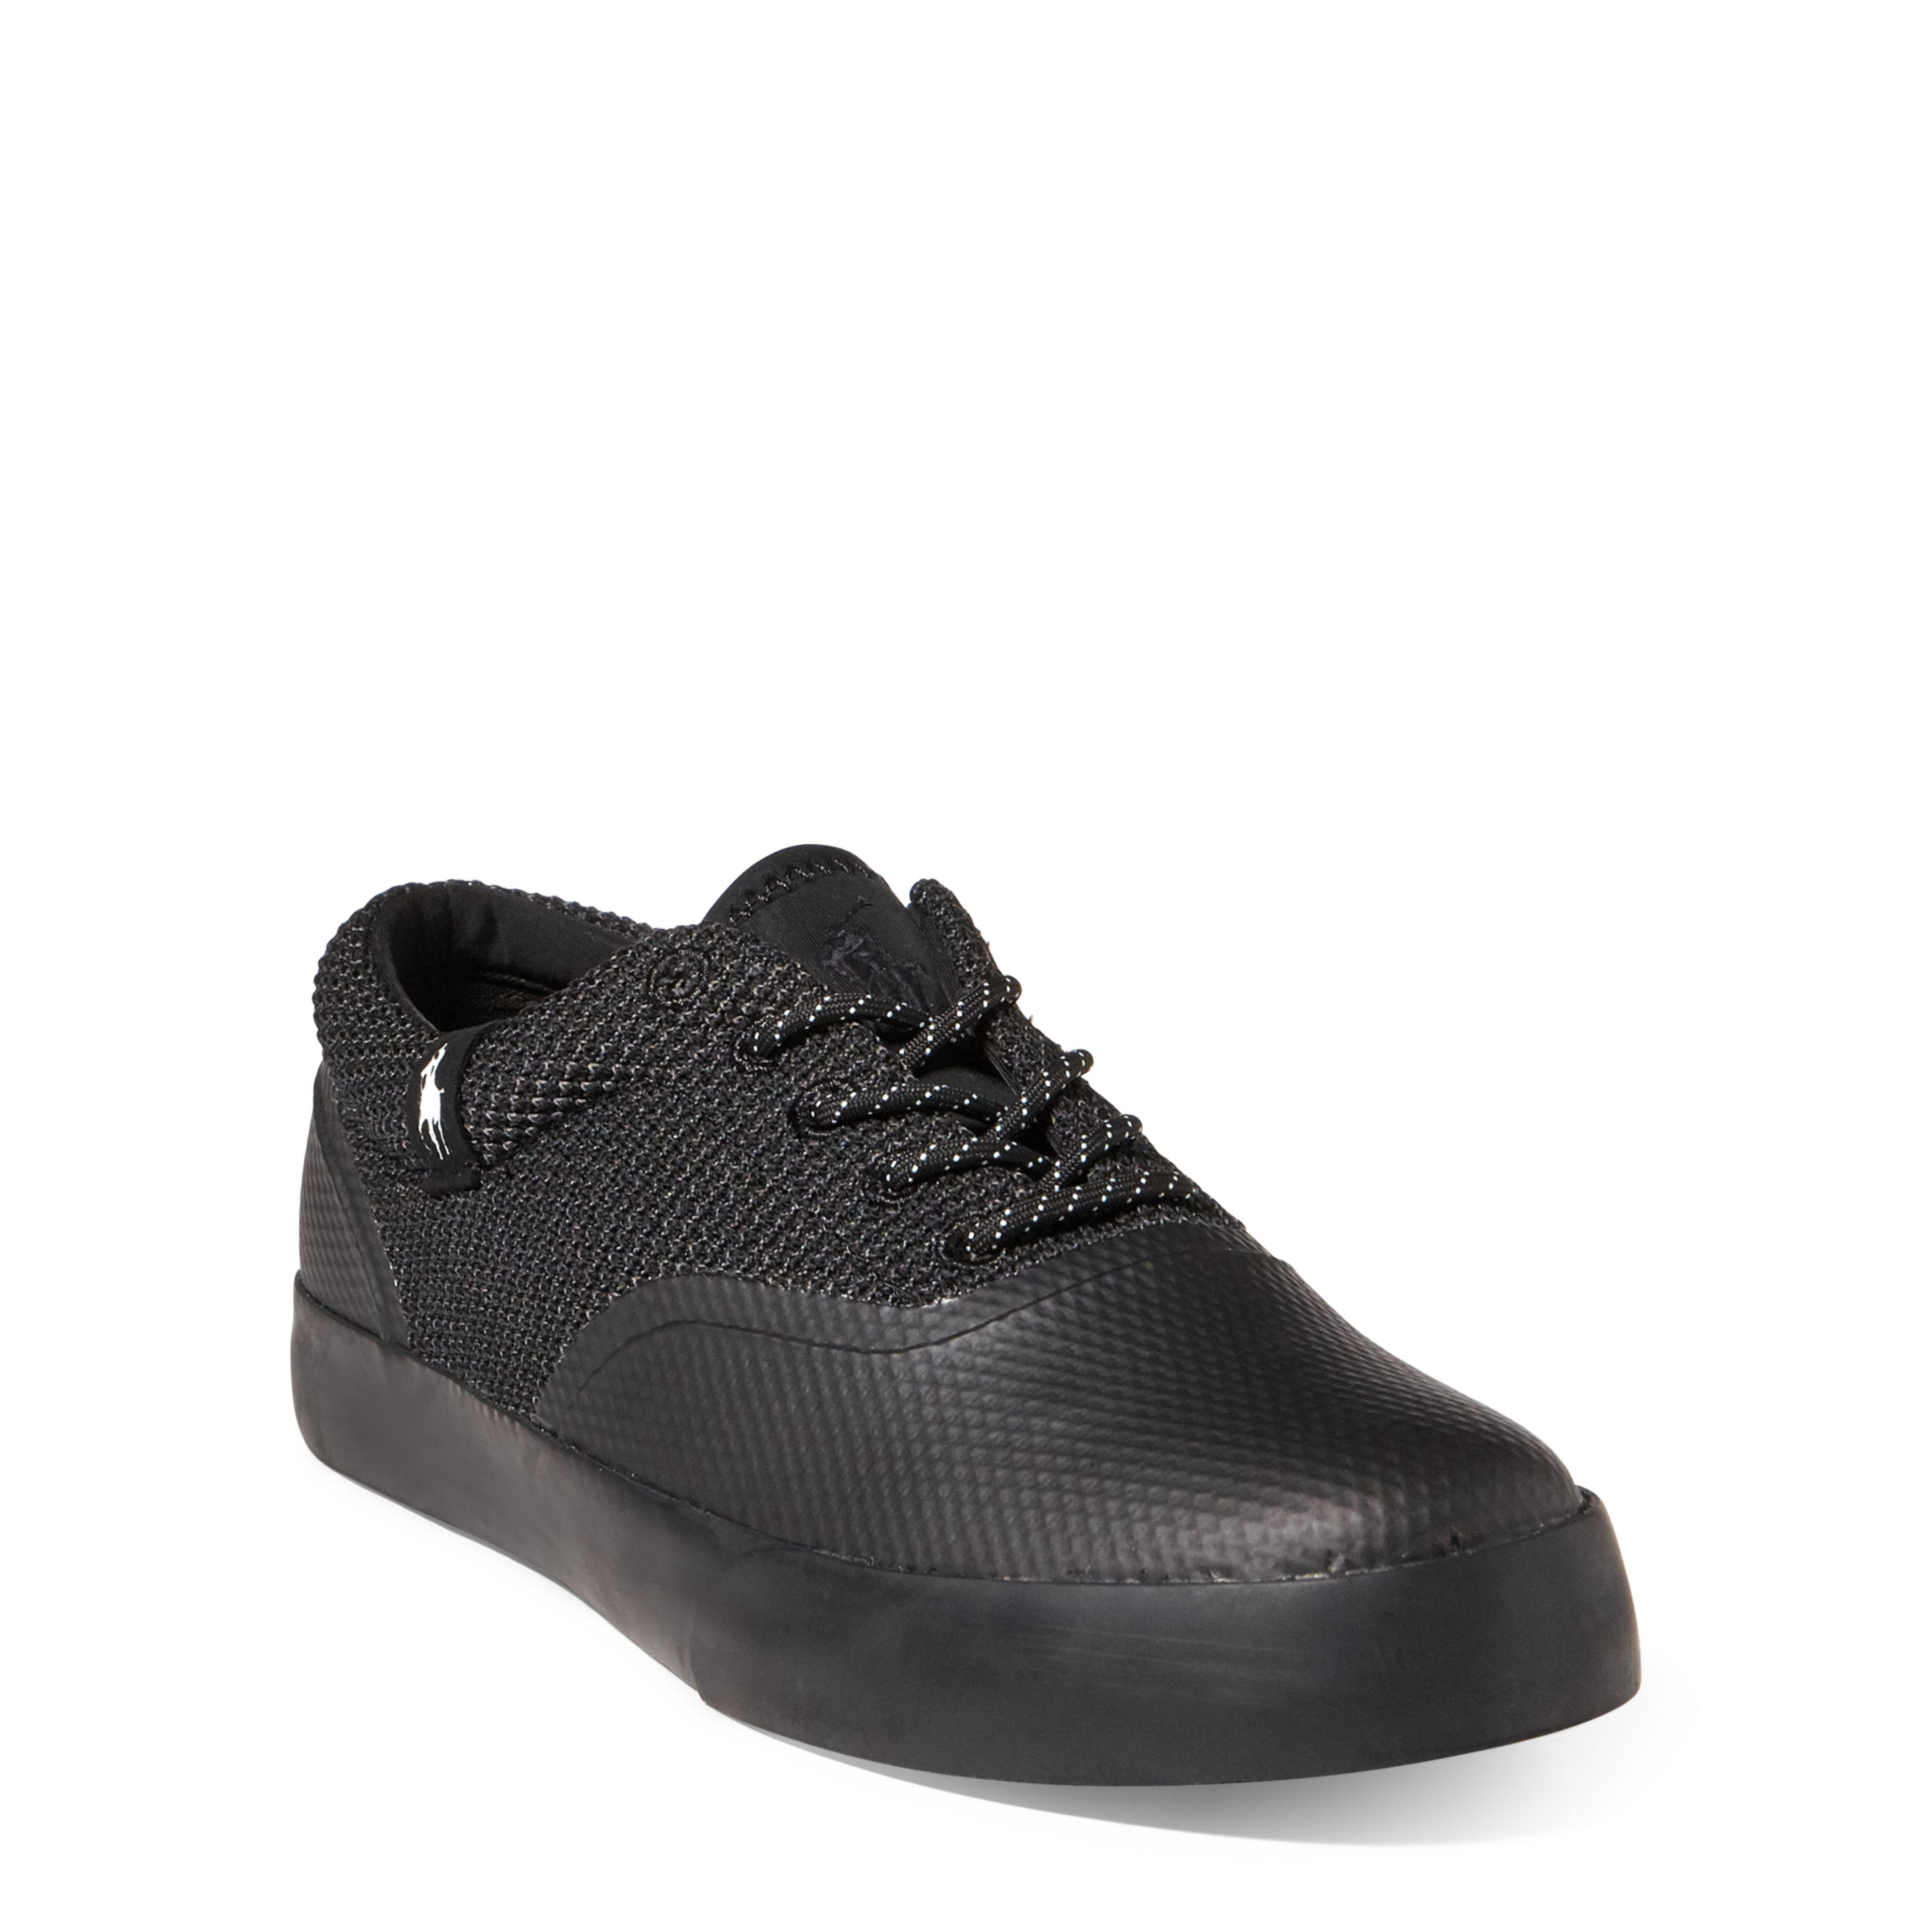 VERNON - Sneaker low - regular black Billig Verkauf Zahlung Mit Visa 7UVMLK